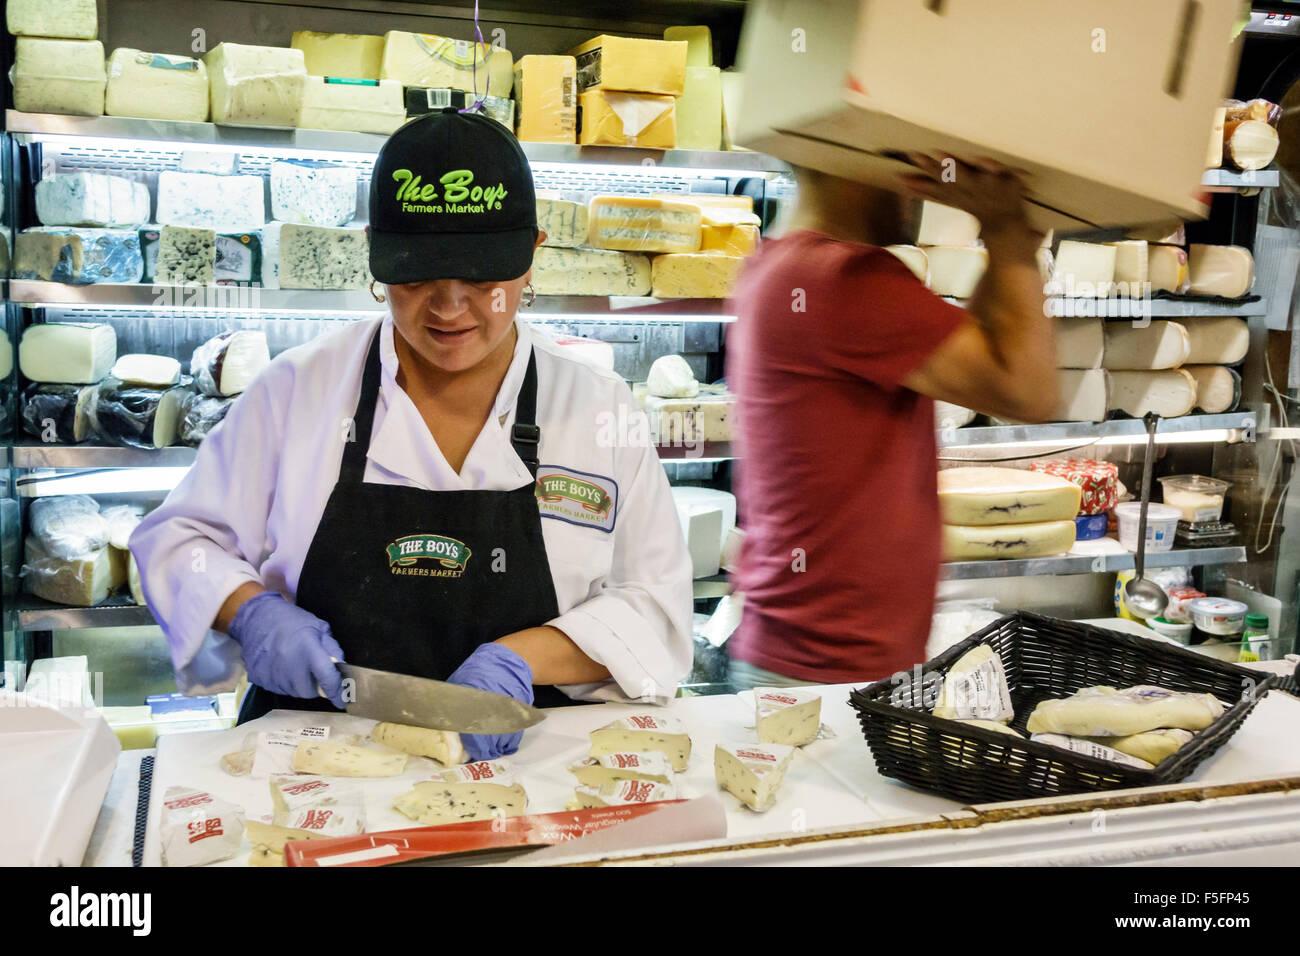 Farmers Market Fort Lauderdale Whole Foods